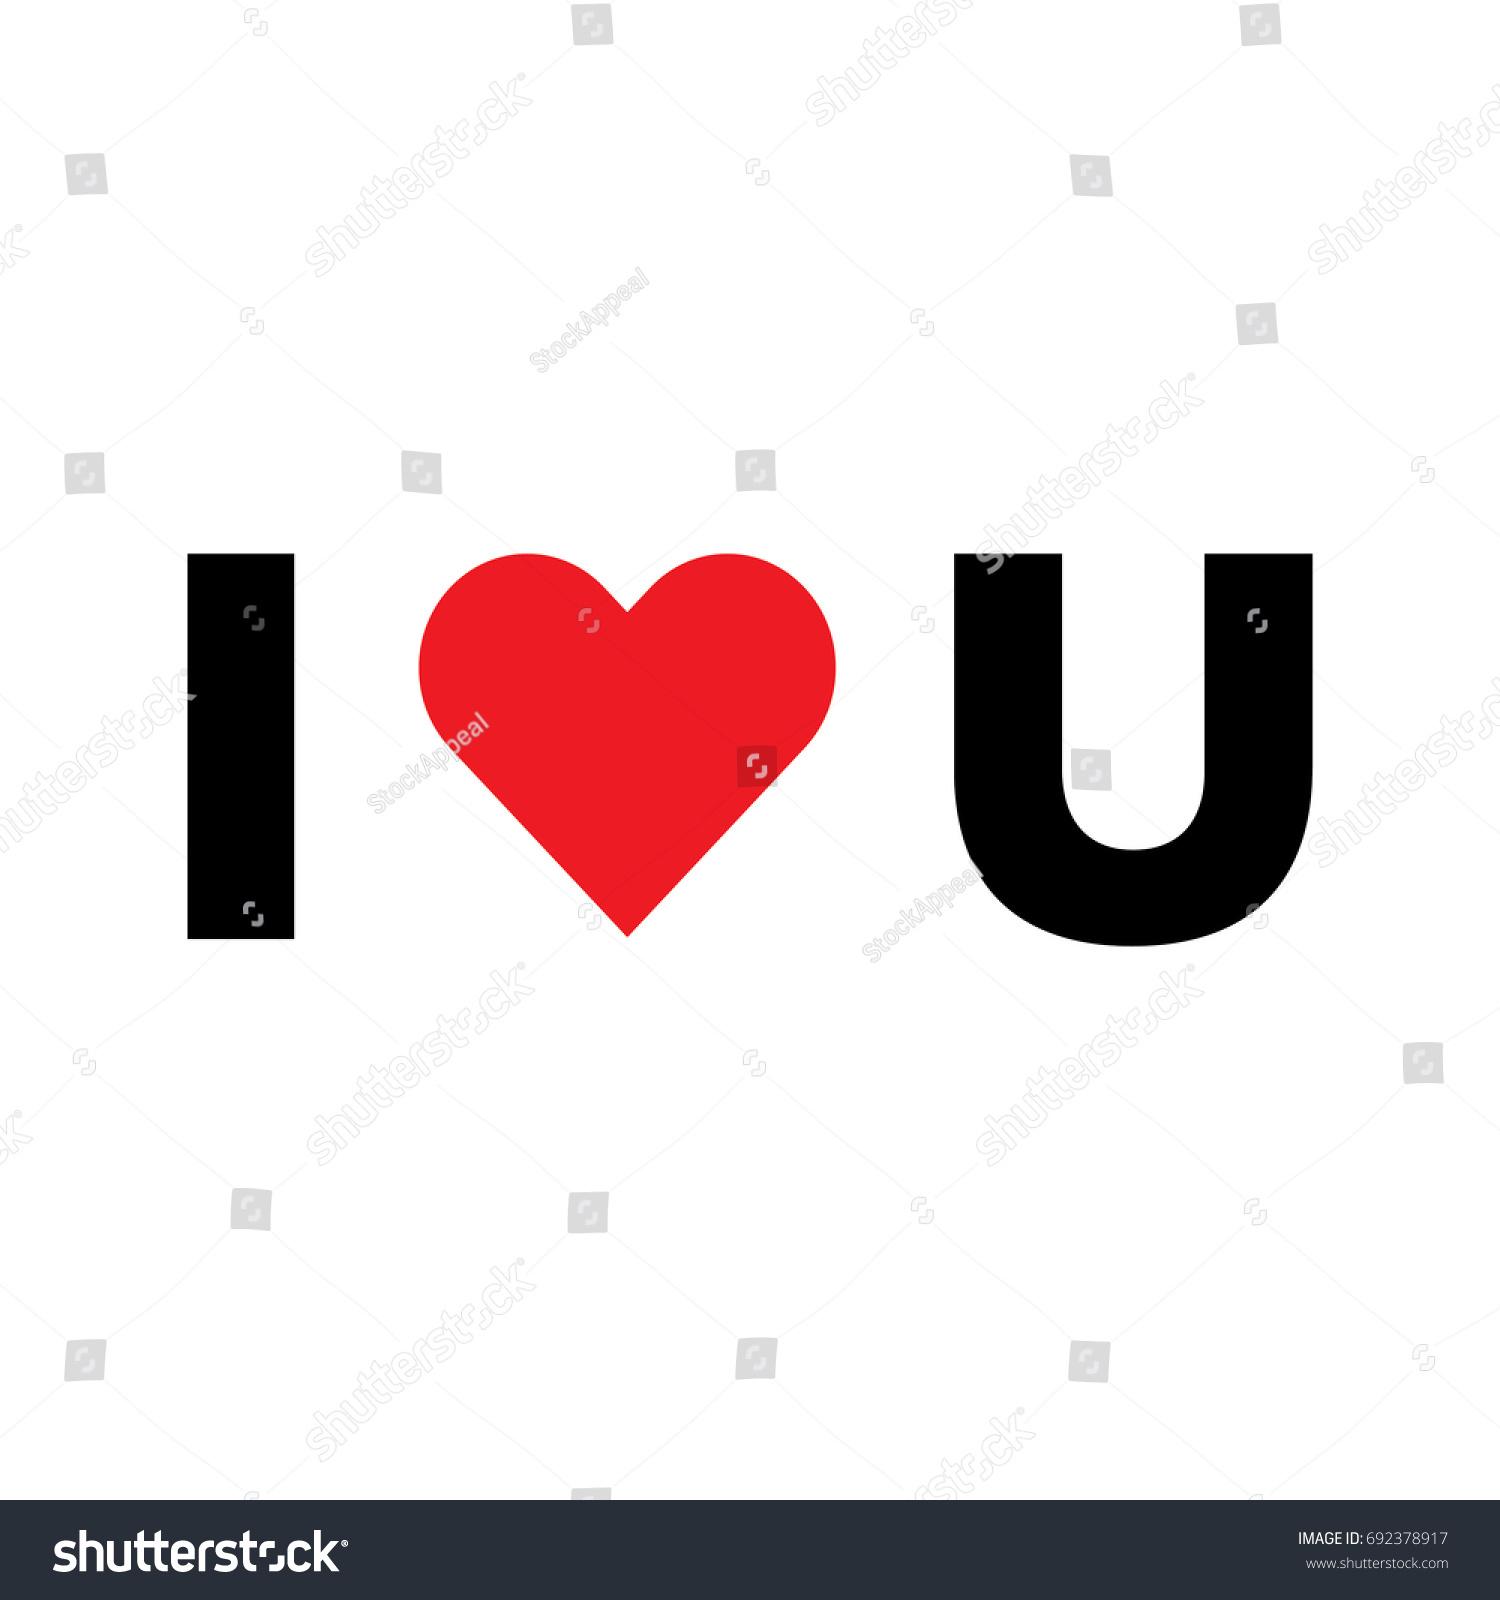 Vector Love You Heart Icon Heart Stock Vector 692378917 Shutterstock